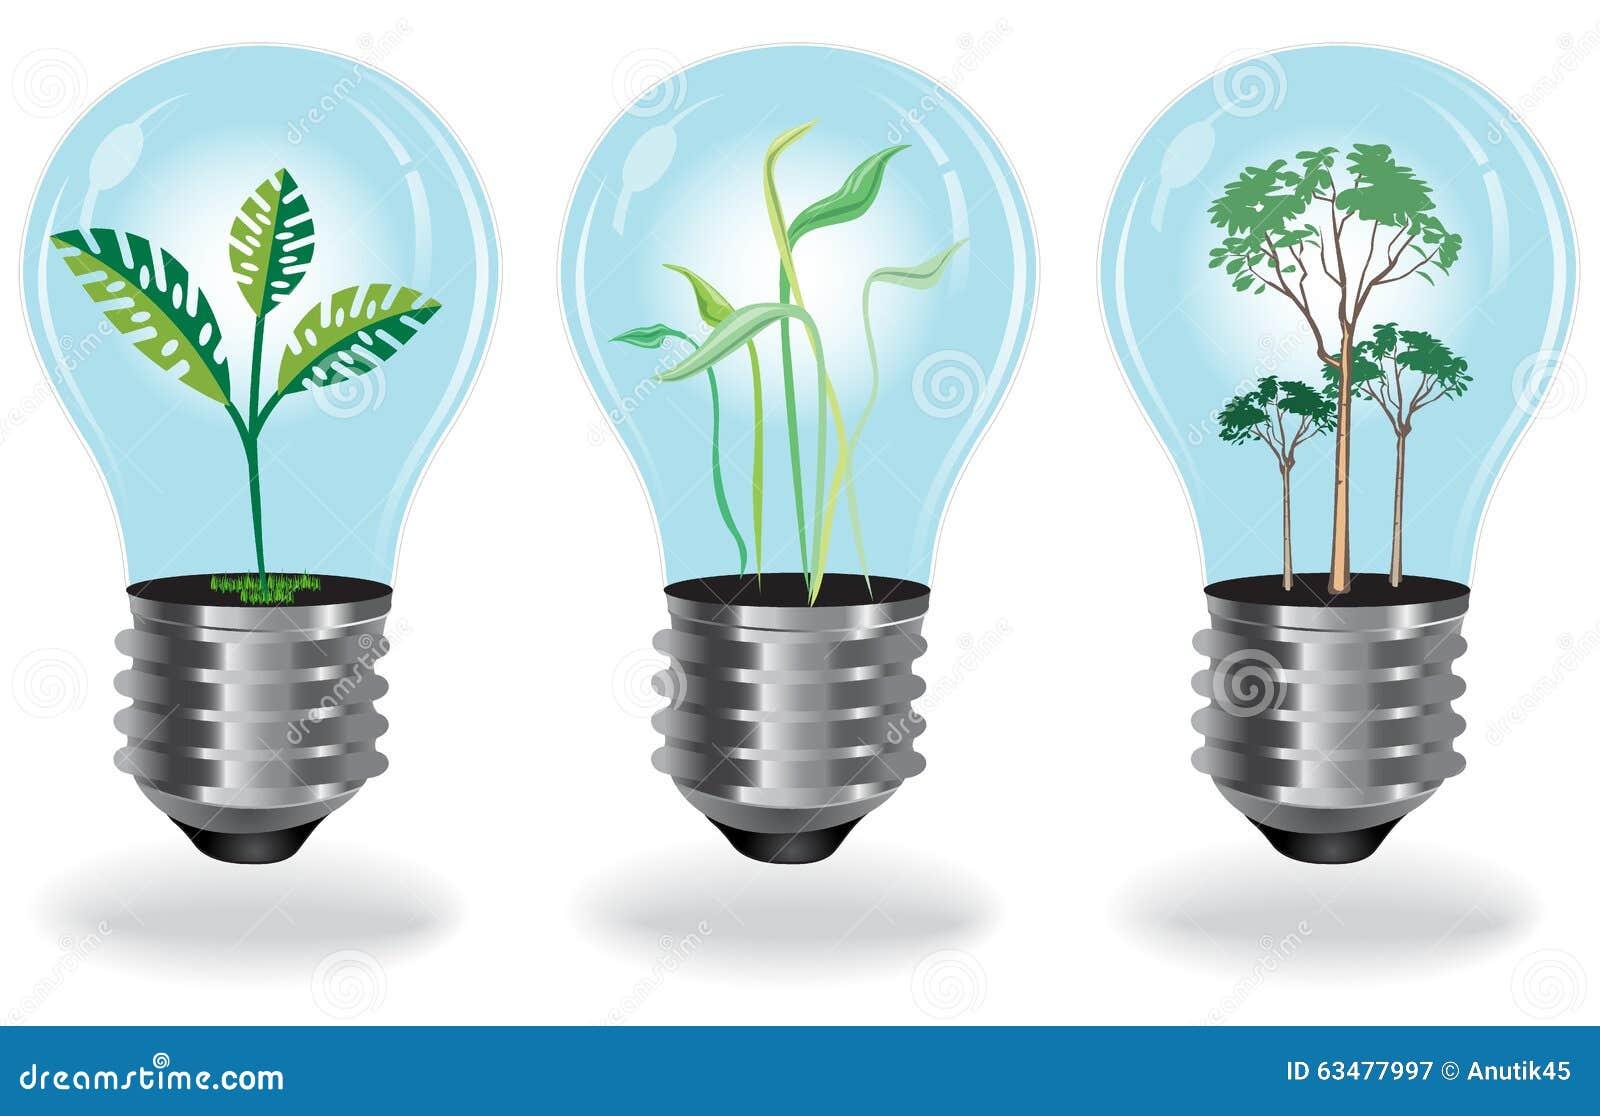 Growing Plants, Bulb, Green Stock Vector - Illustration of